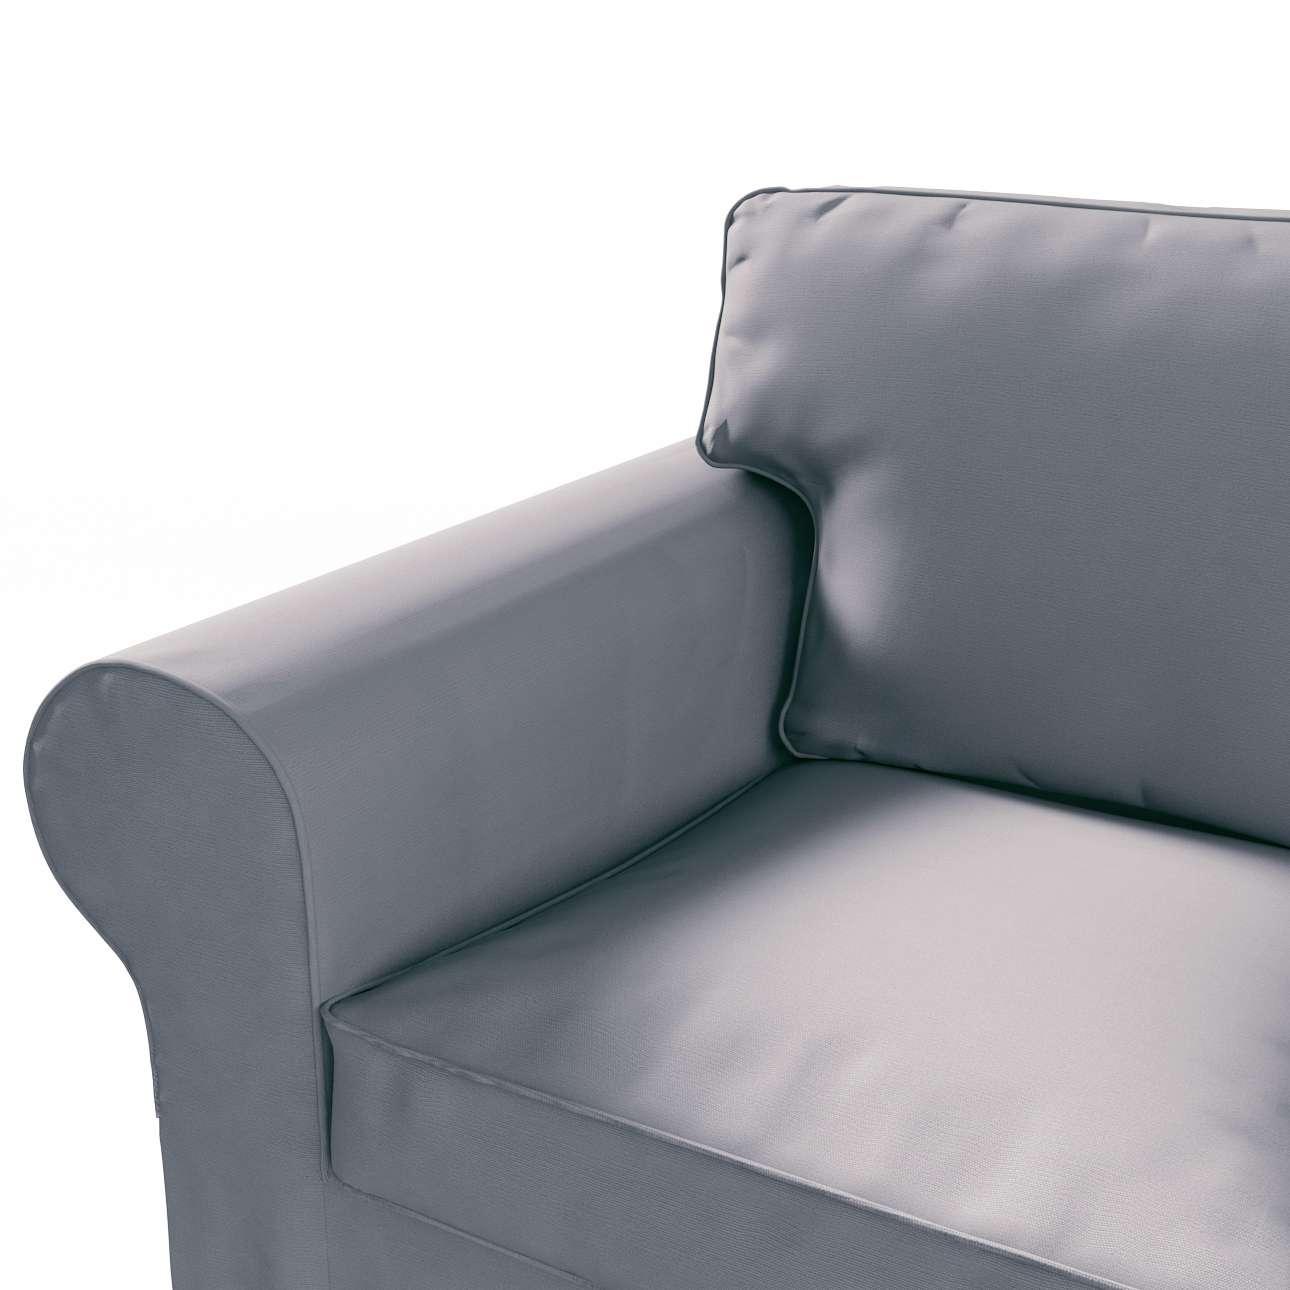 Ektorp 3-Sitzer Schlafsofabezug, ALTES Modell Sofahusse Ektorp 3-Sitzer Schlafsofa von der Kollektion Cotton Panama, Stoff: 702-07